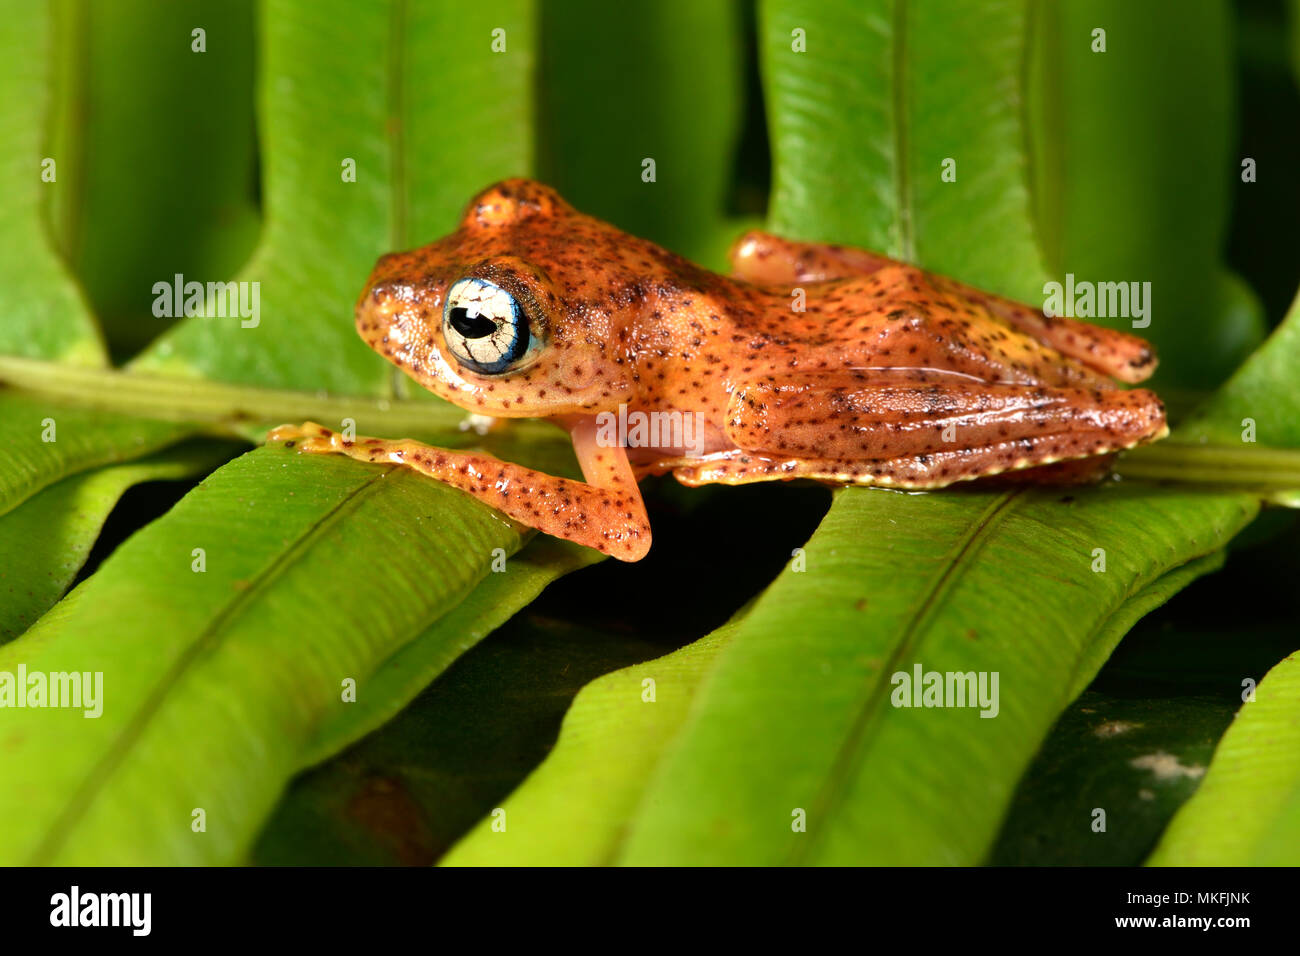 Fiery Bright-eyed Frog (Boophis pyrrhus), Andasibe, Perinet, Region Alaotra-Mangoro, Madagascar - Stock Image